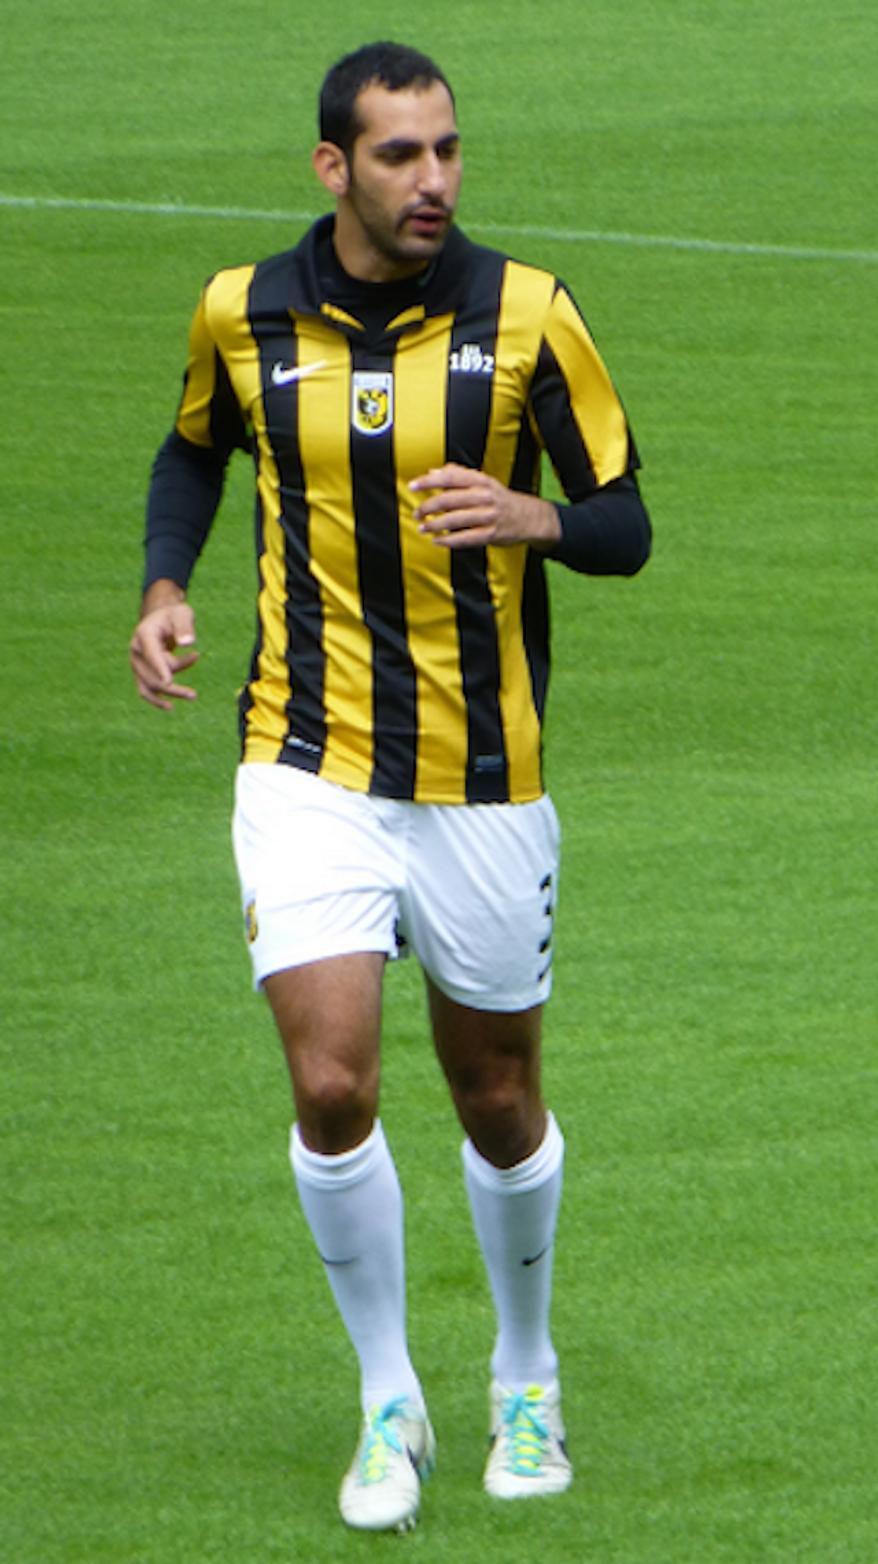 Dan Mori, player of Vitesse, training at National Sports Centre Papendal. (Wikimedia Commons)